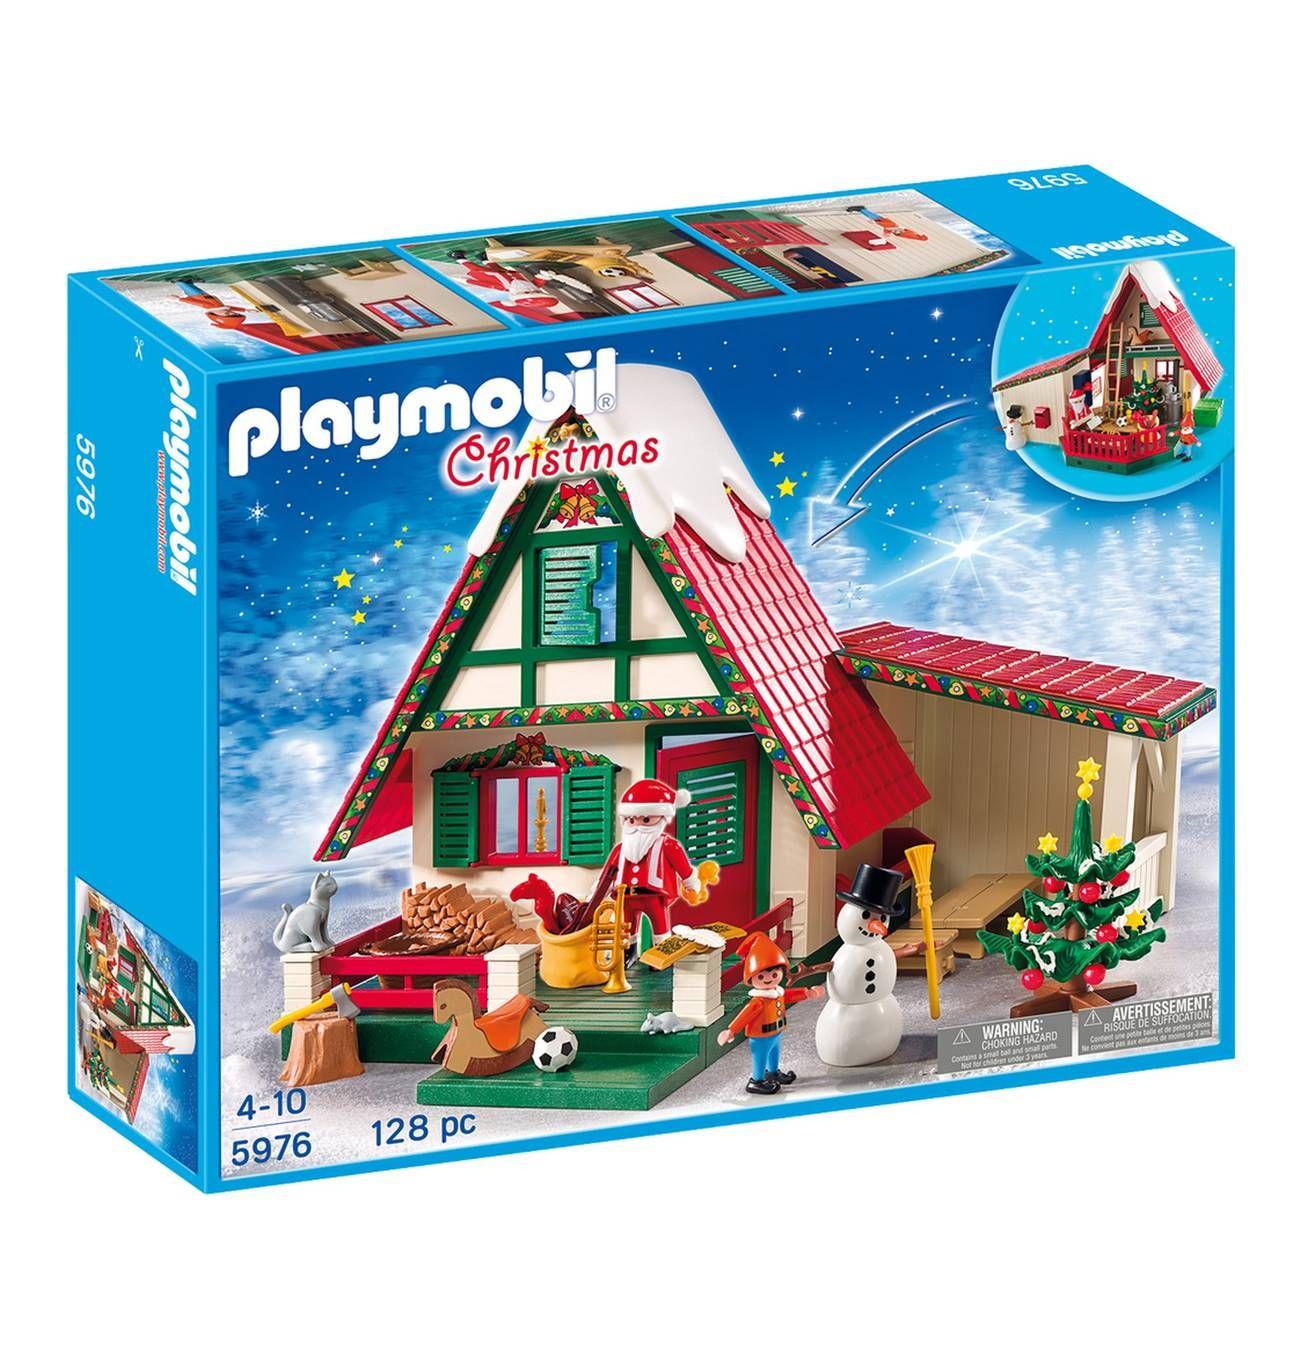 Playmobil Weihnachtsbaum.Playmobil Christmas Zuhause Beim Weihnachtsmann 5976 Playmobil